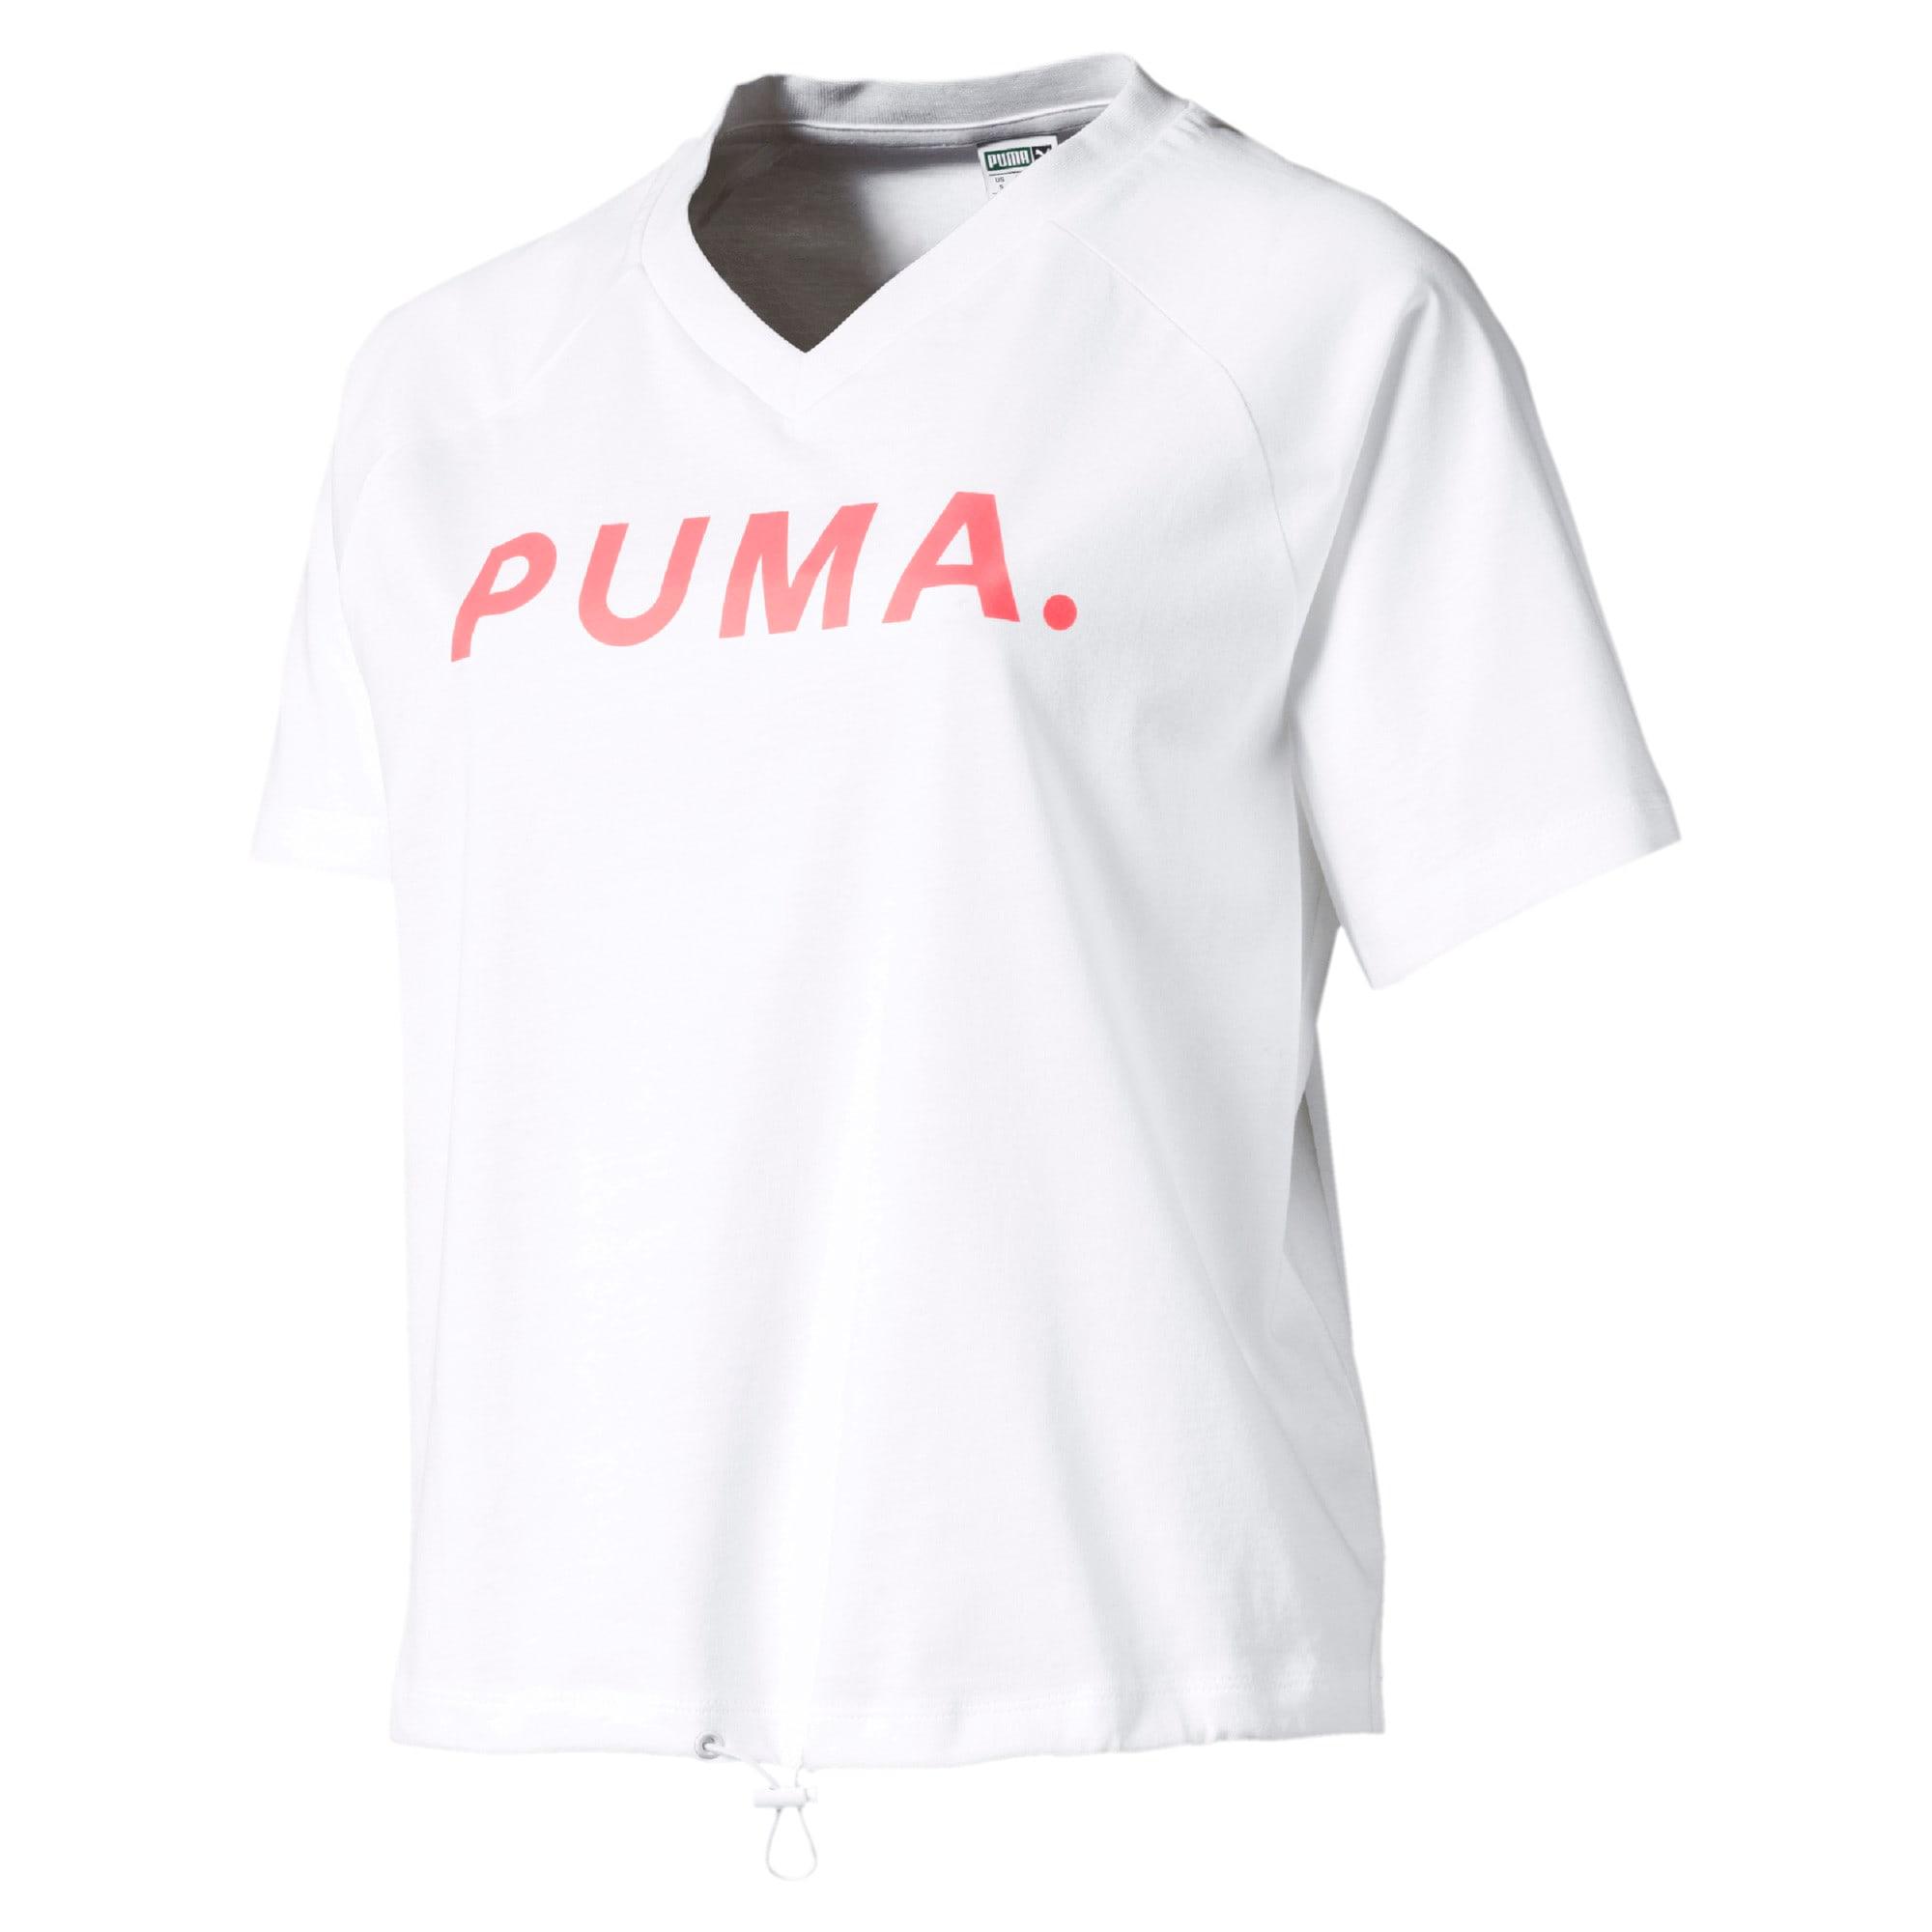 Thumbnail 1 of CHASE V SS ウィメンズ Tシャツ 半袖, Puma White, medium-JPN